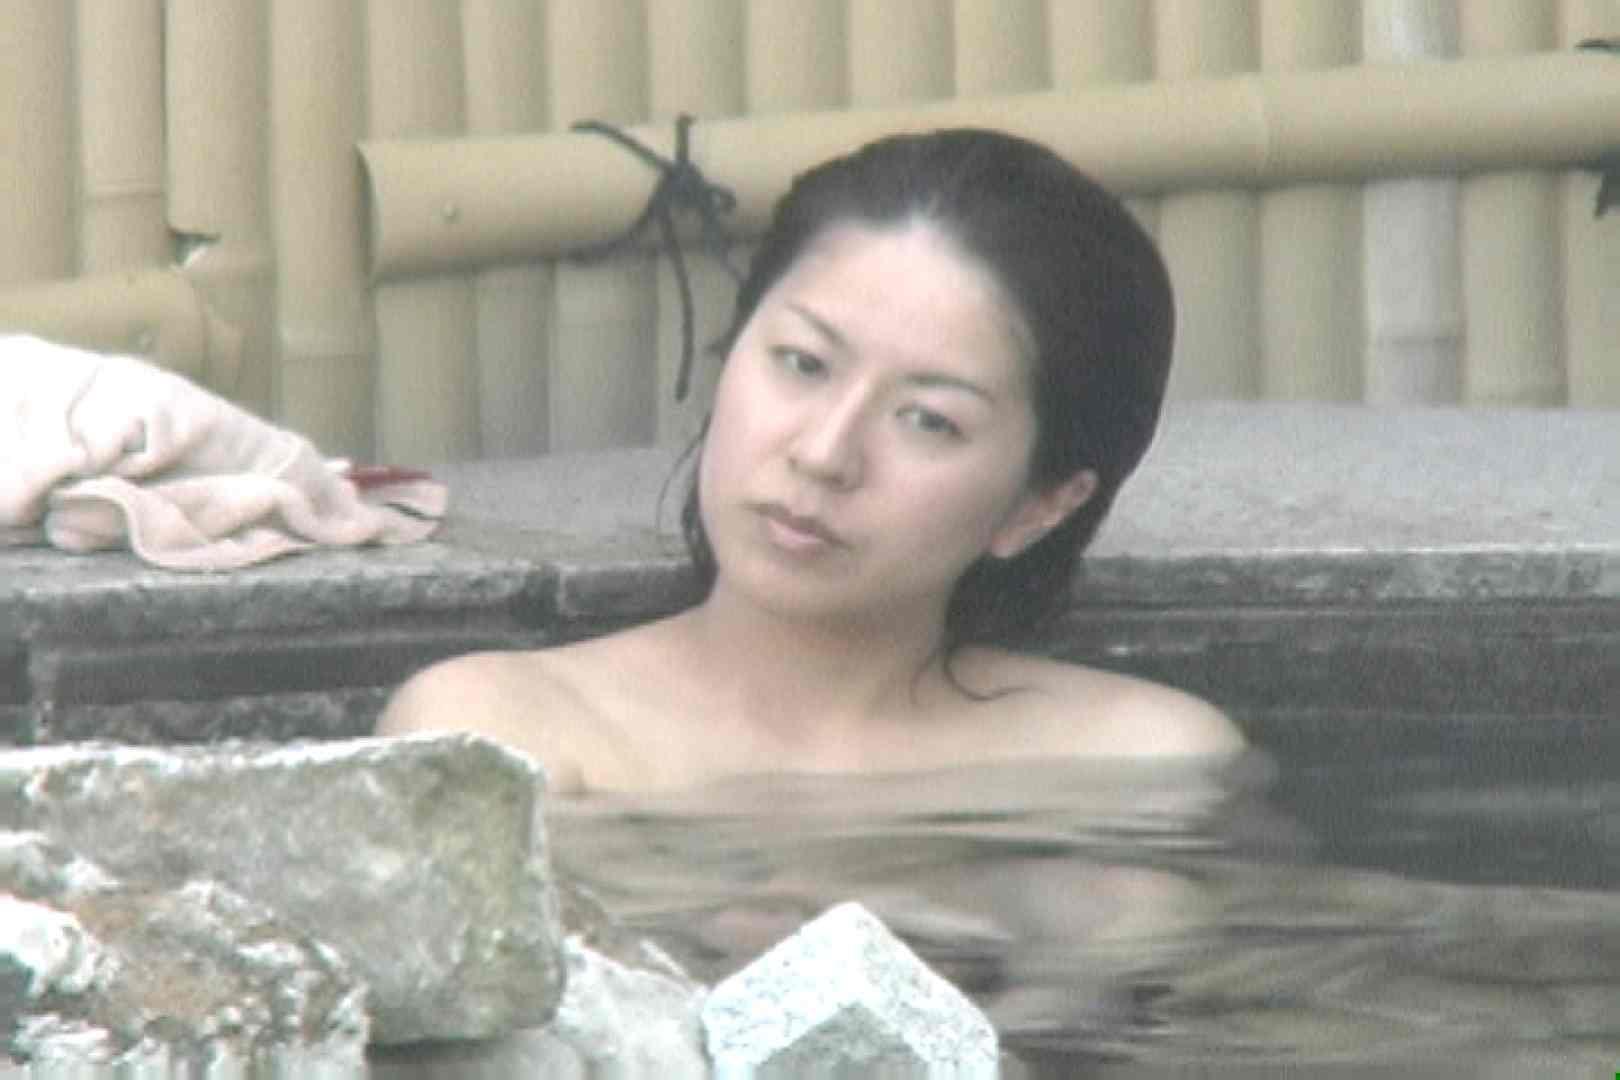 Aquaな露天風呂Vol.694 露天 | OLセックス  67画像 61